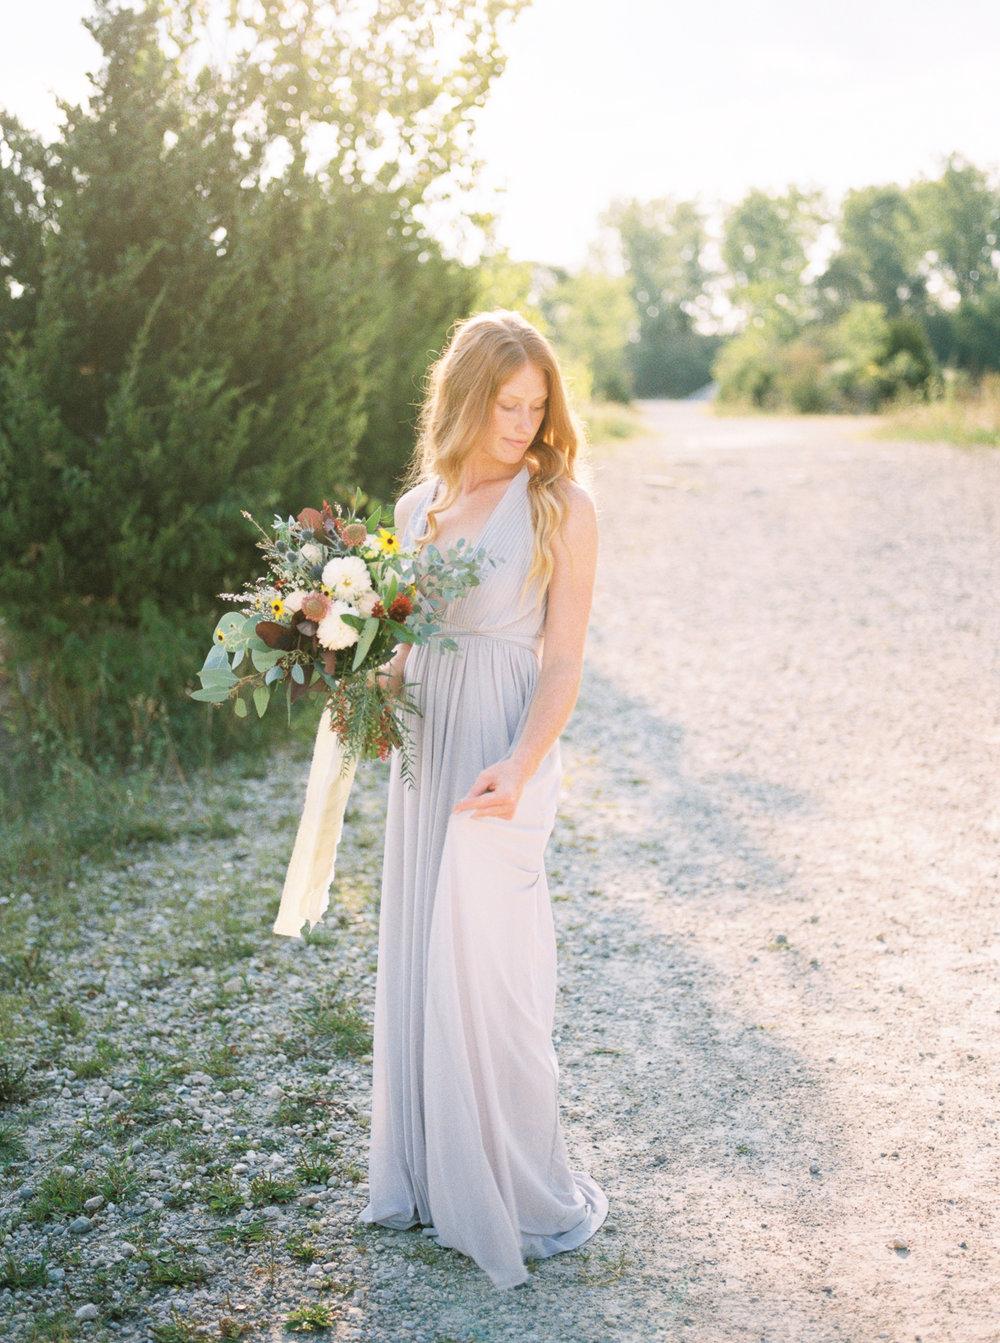 Fine_Art_Film_Wedding_Photographer_Tonya_Espy_Photography-40.jpg